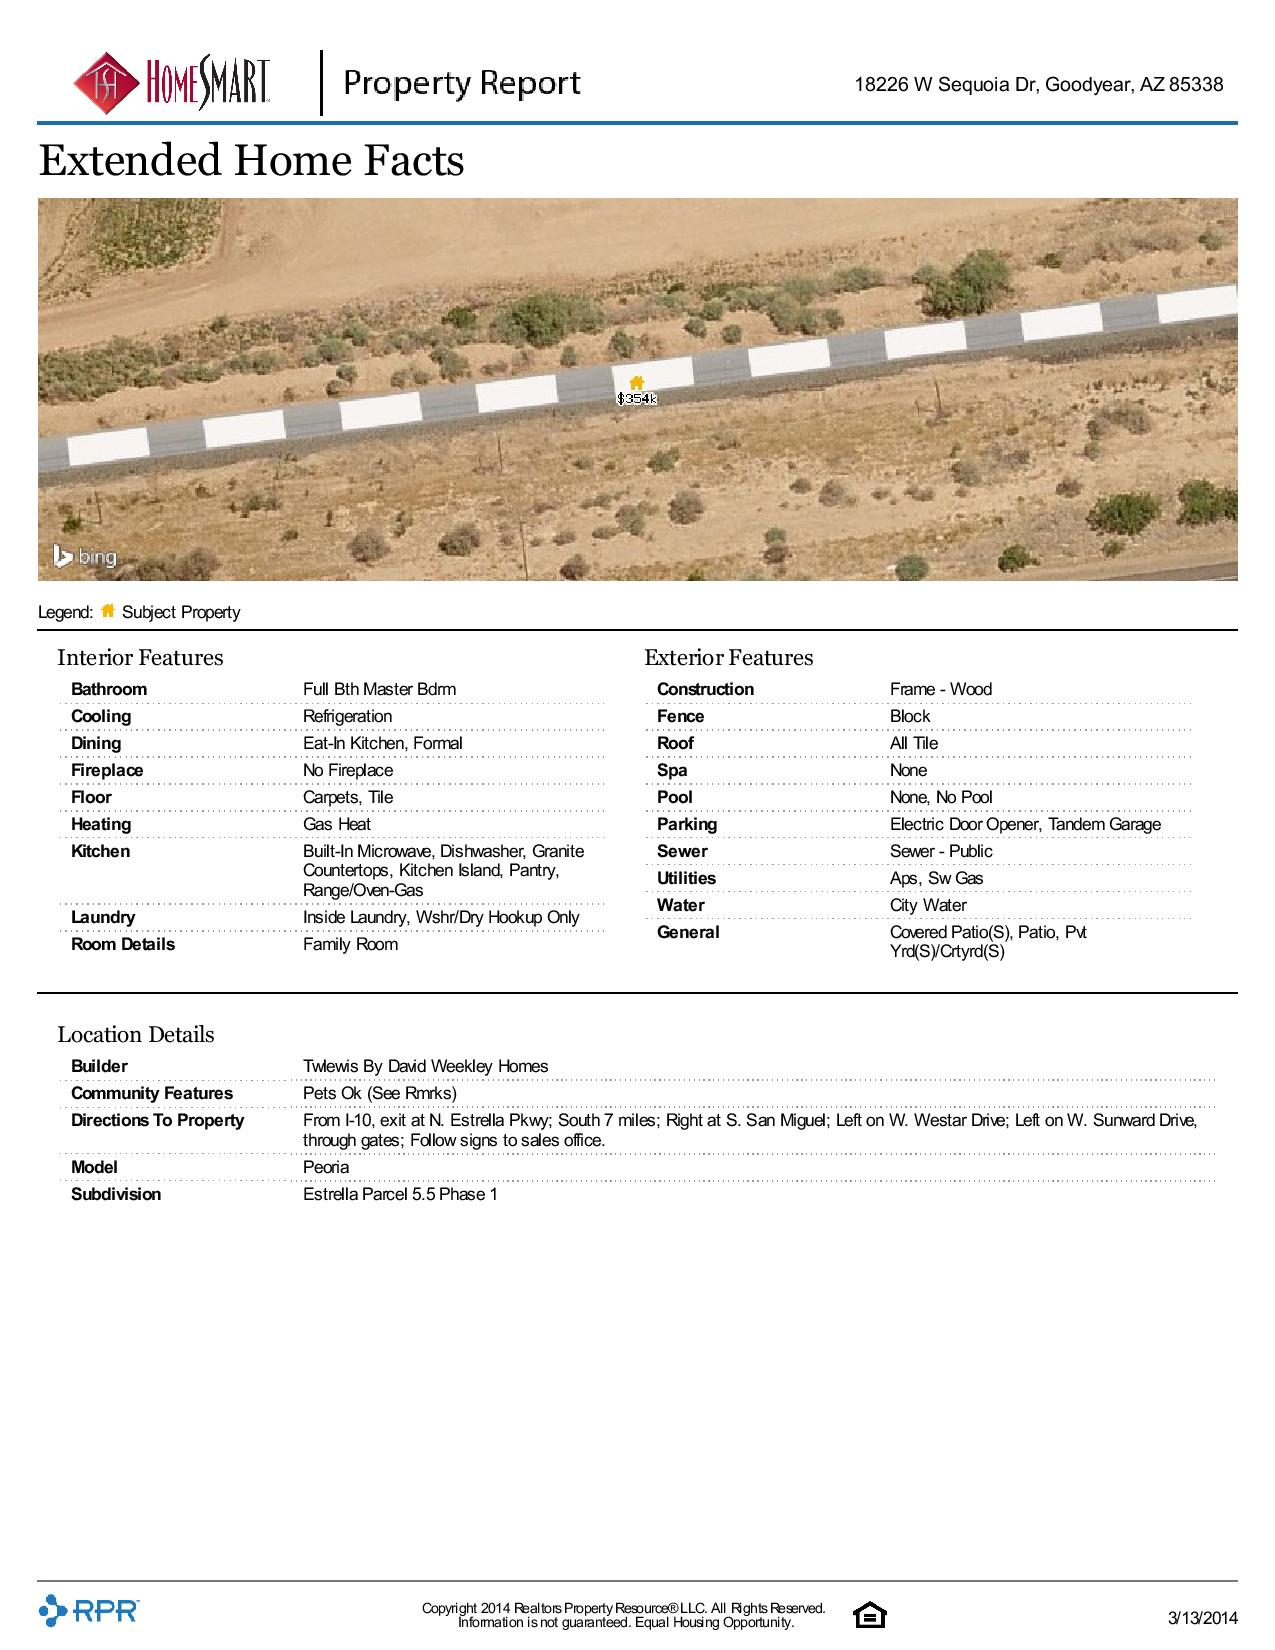 18226-W-Sequoia-Dr-Goodyear-AZ-85338-page-004